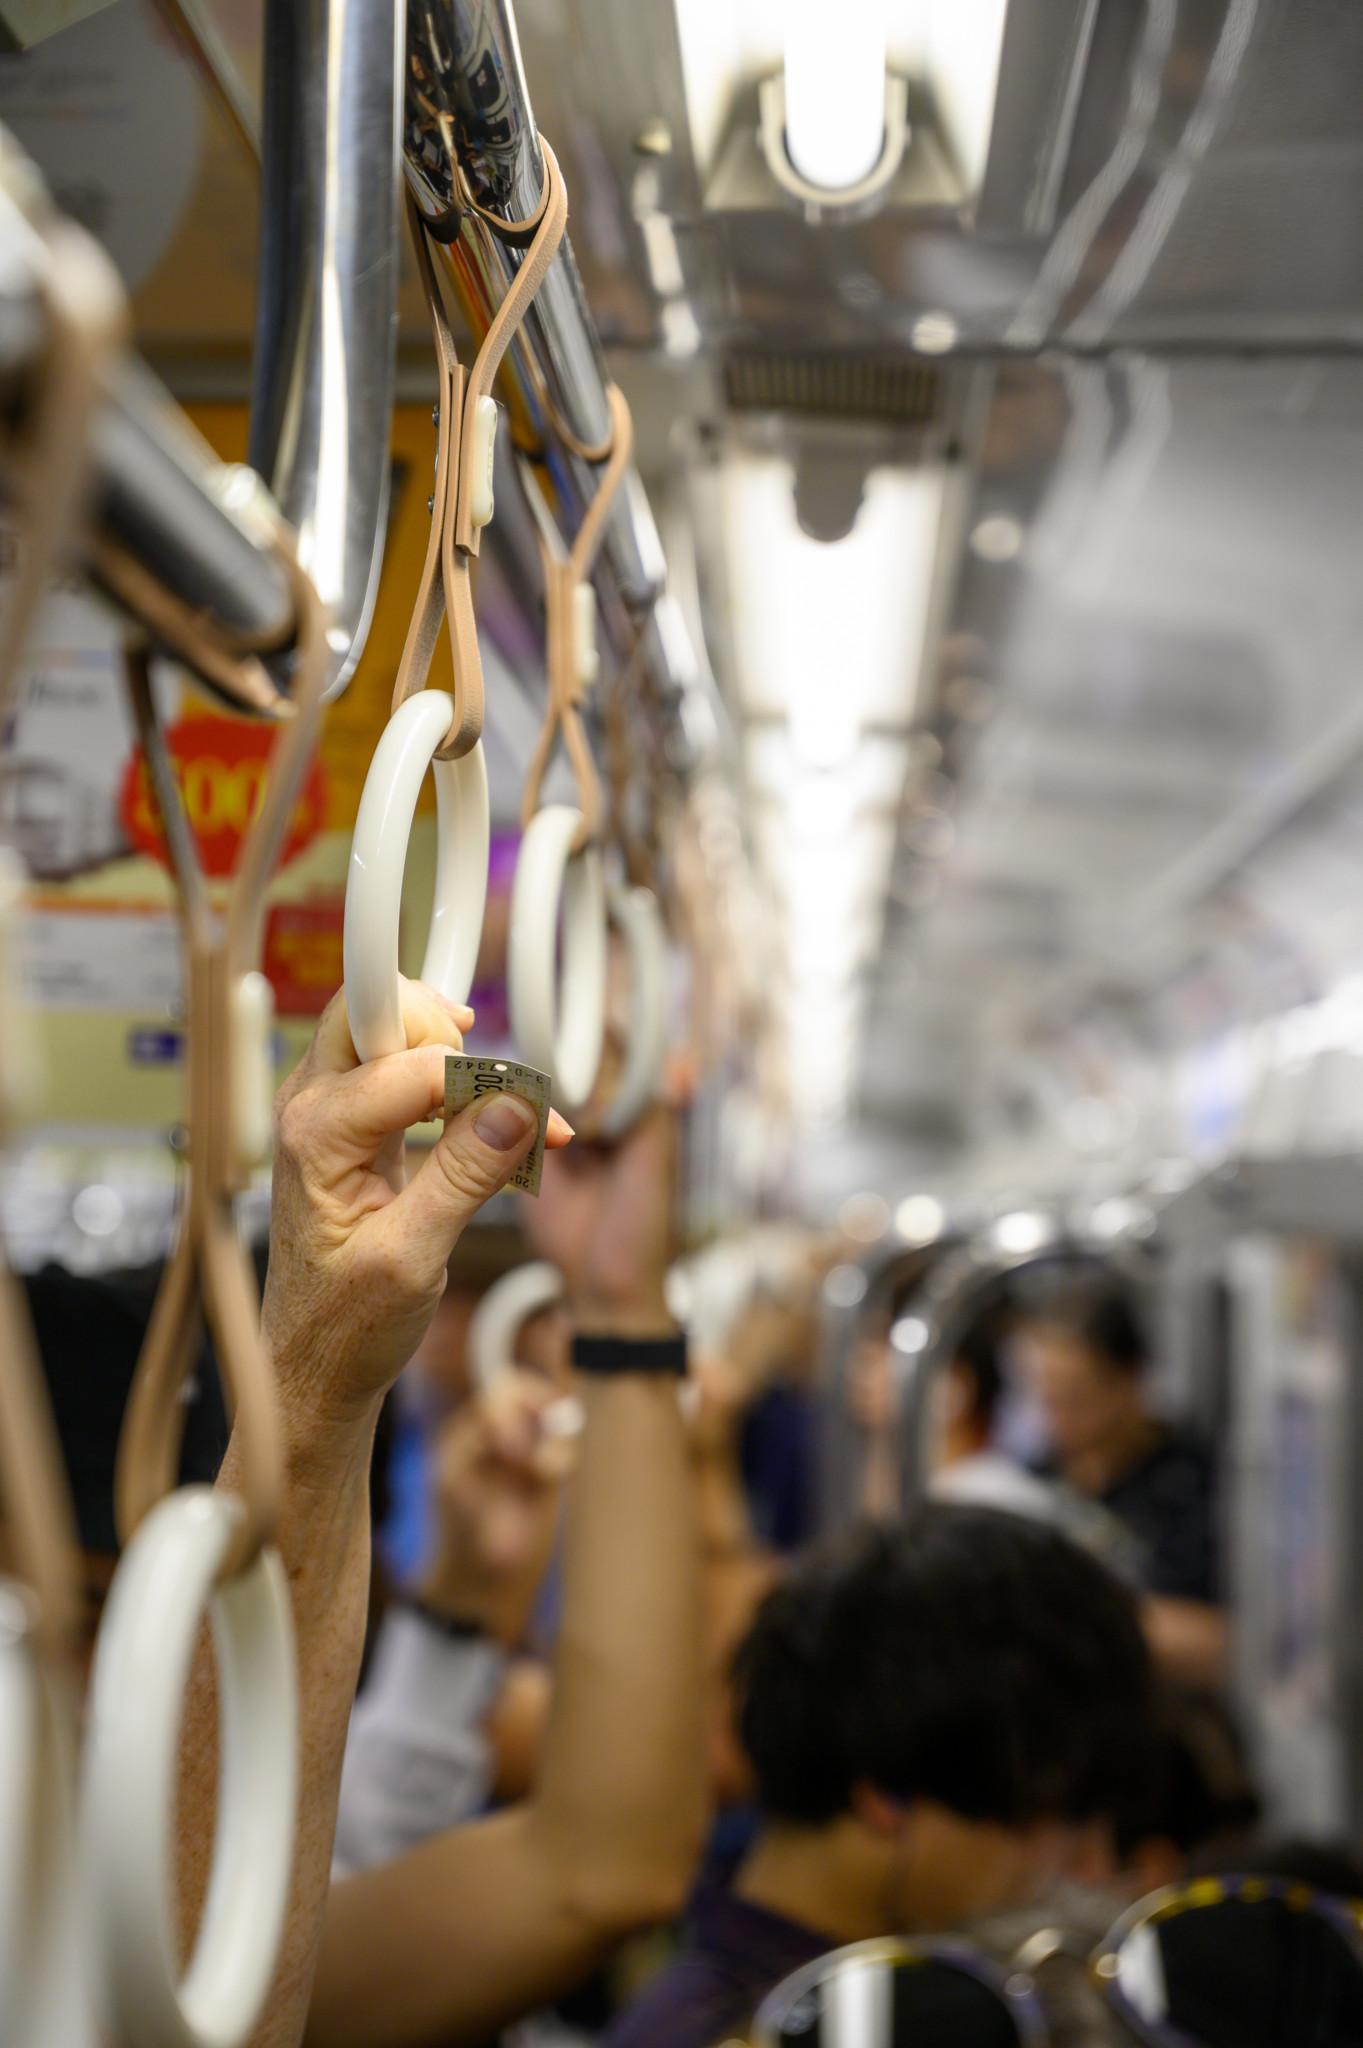 Metro fahren in Osaka in Japan